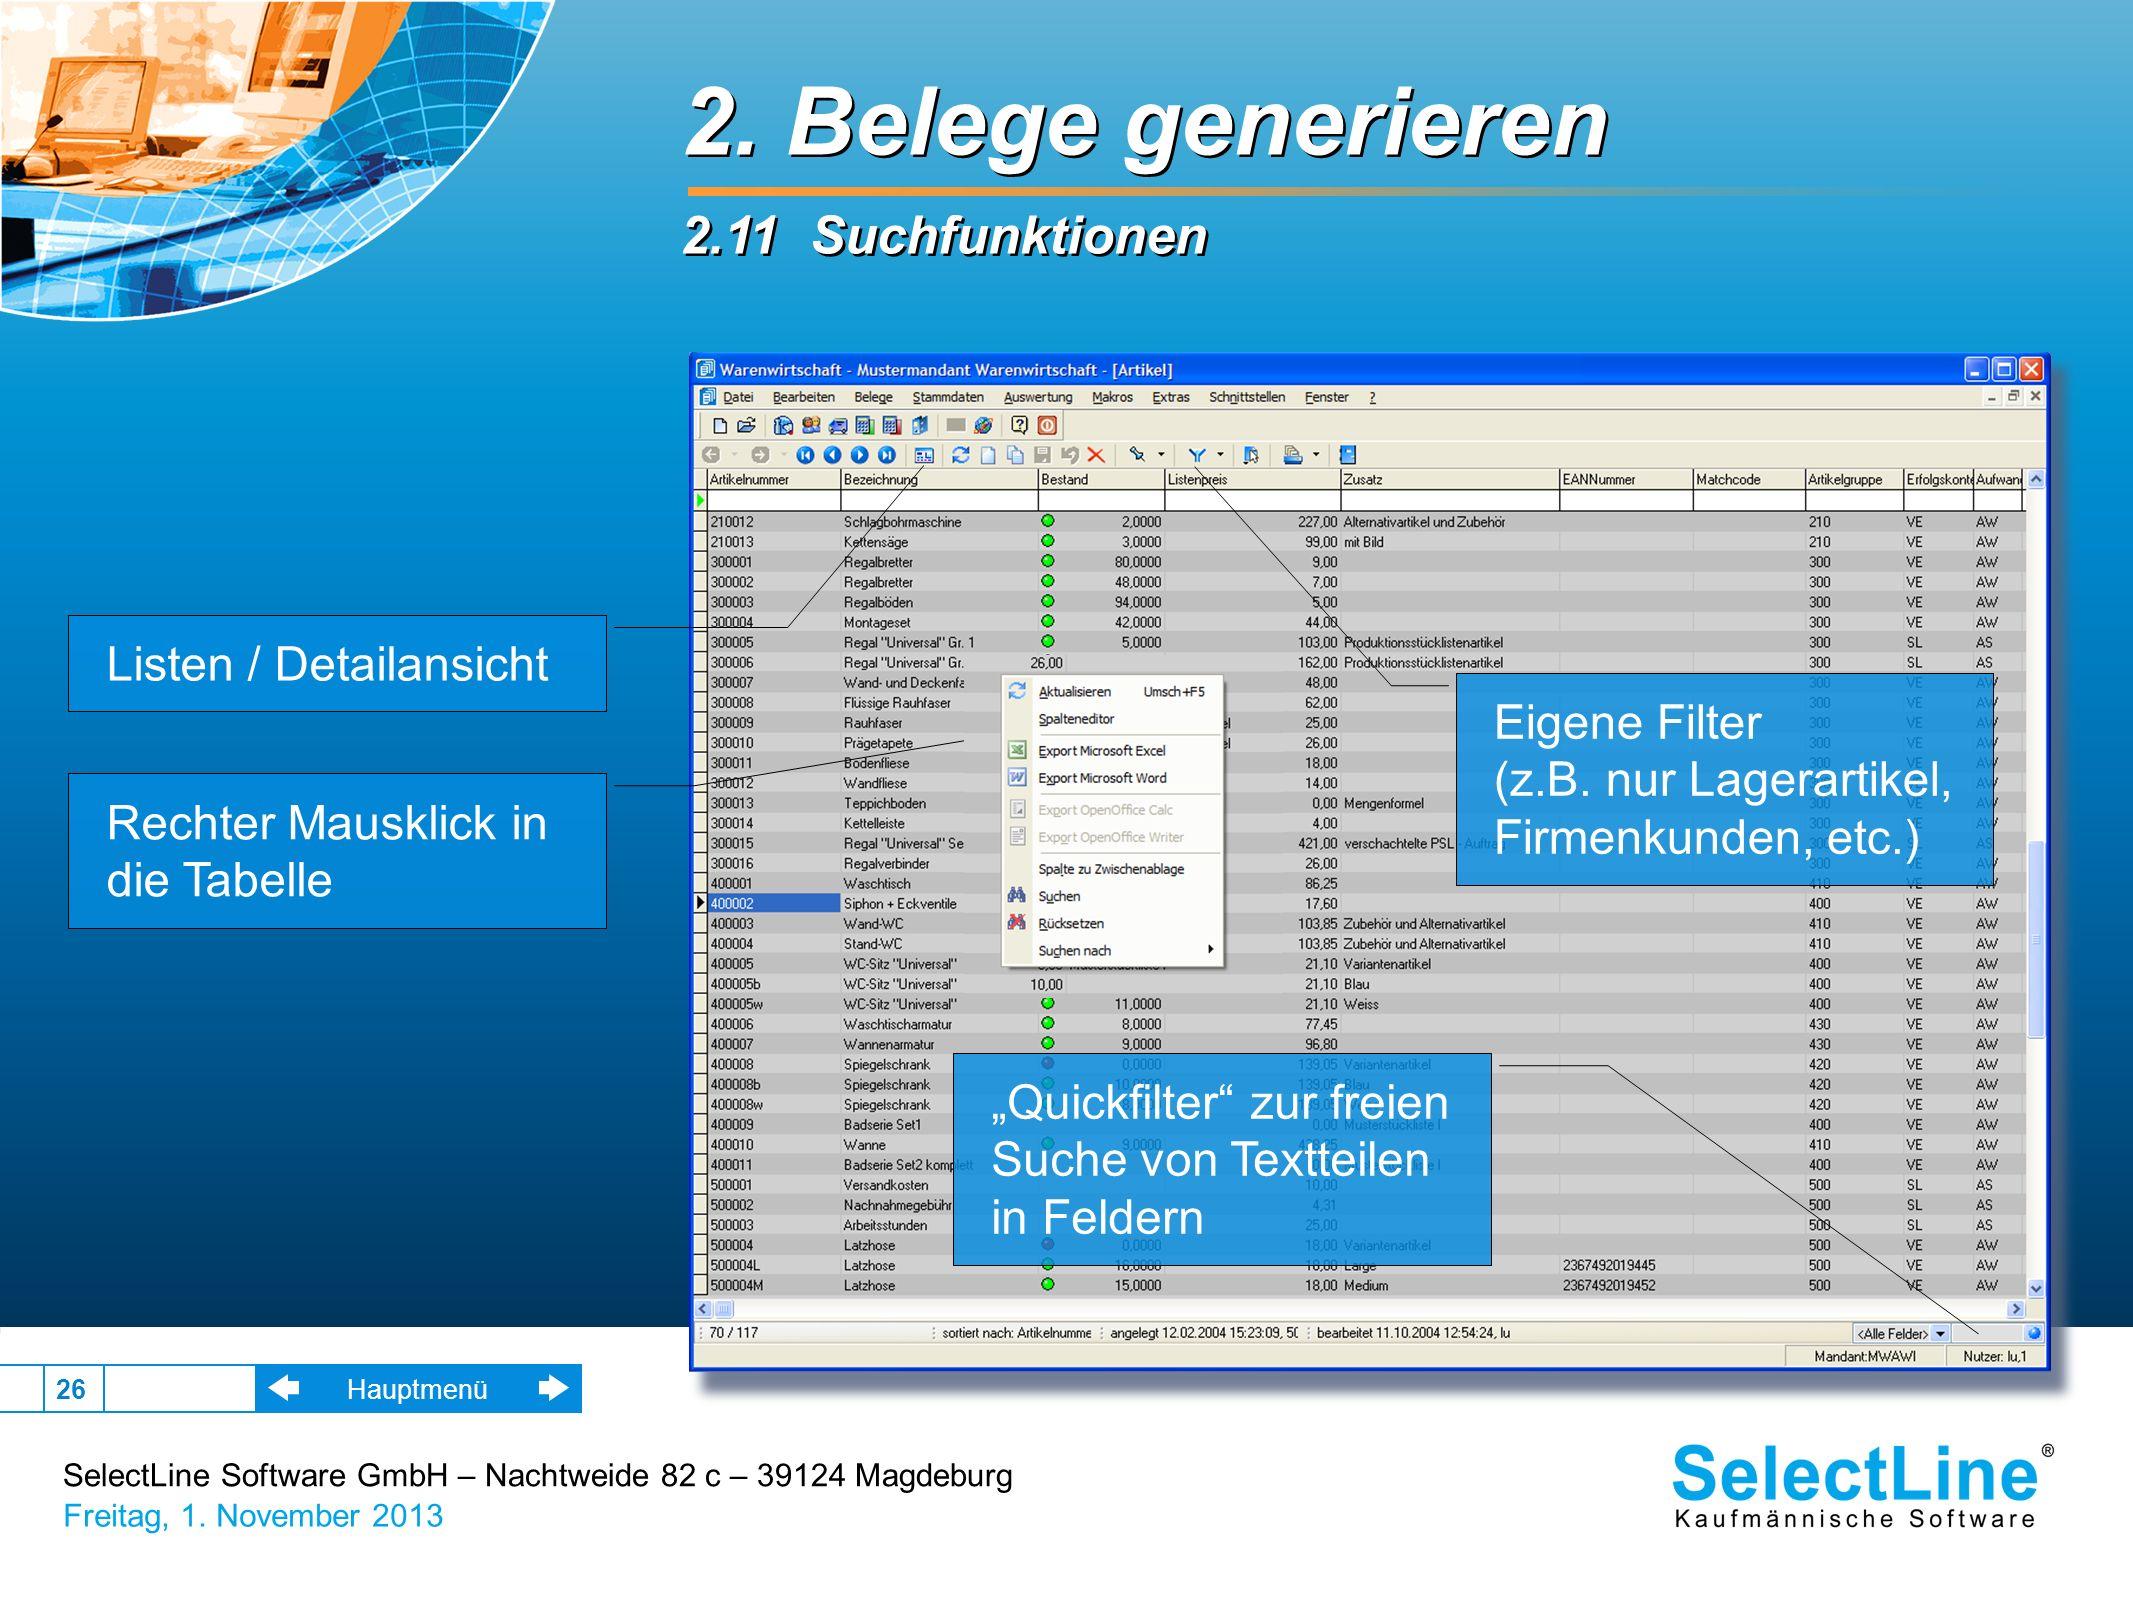 SelectLine Software GmbH – Nachtweide 82 c – 39124 Magdeburg Freitag, 1. November 2013 26 2. Belege generieren 2.11 Suchfunktionen 2. Belege generiere